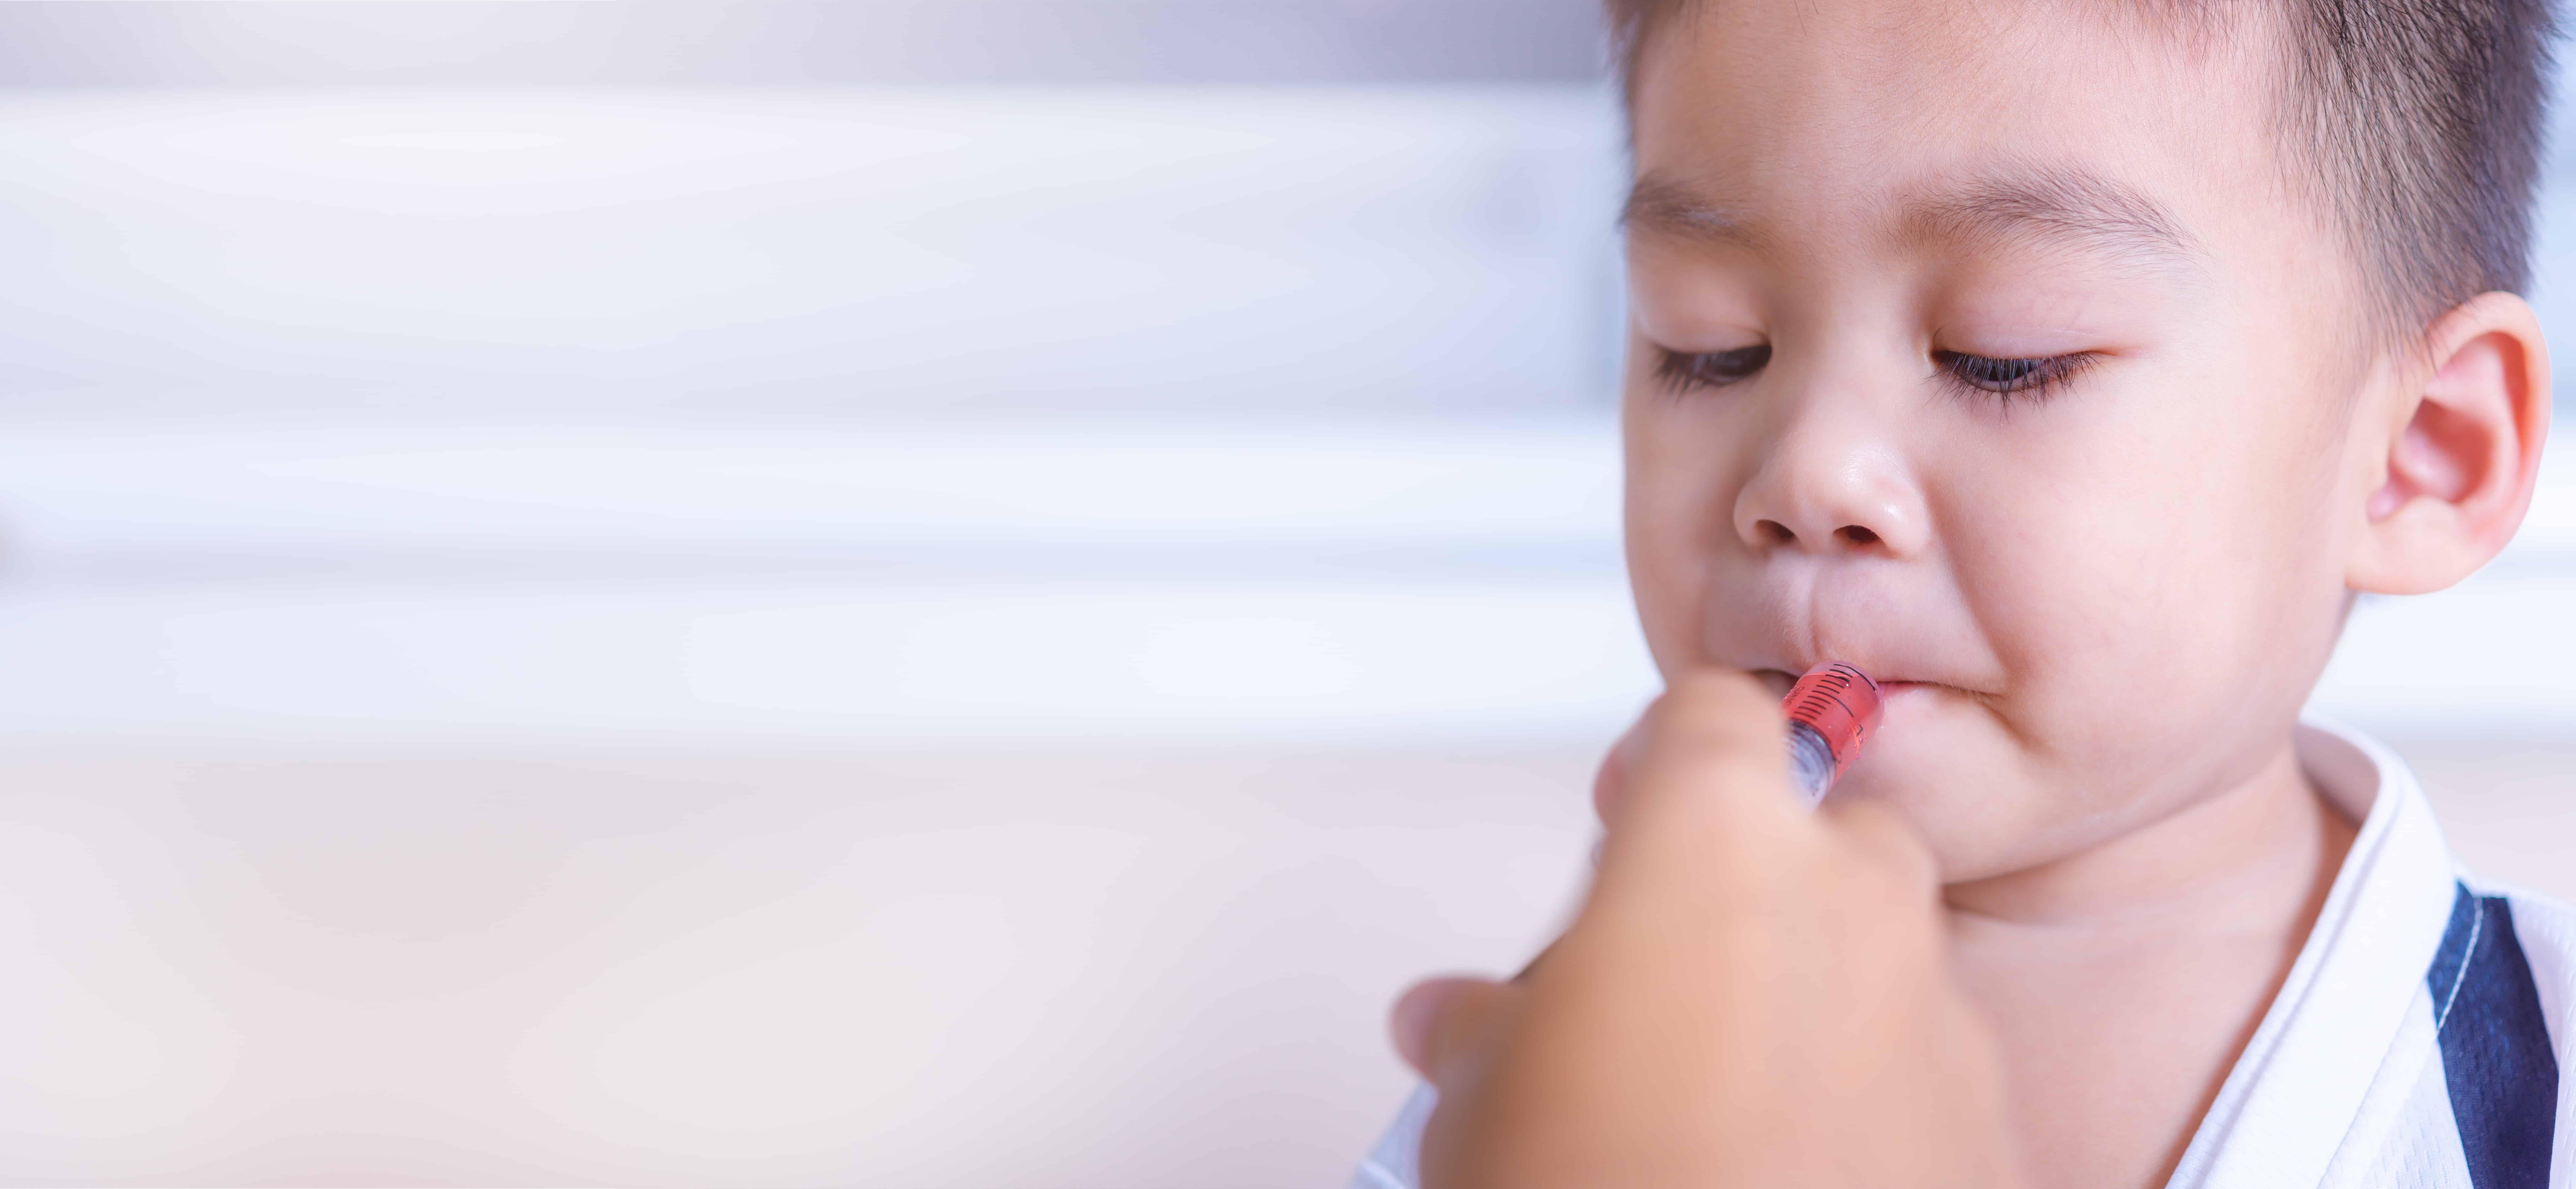 Child receiving medicine via syringe